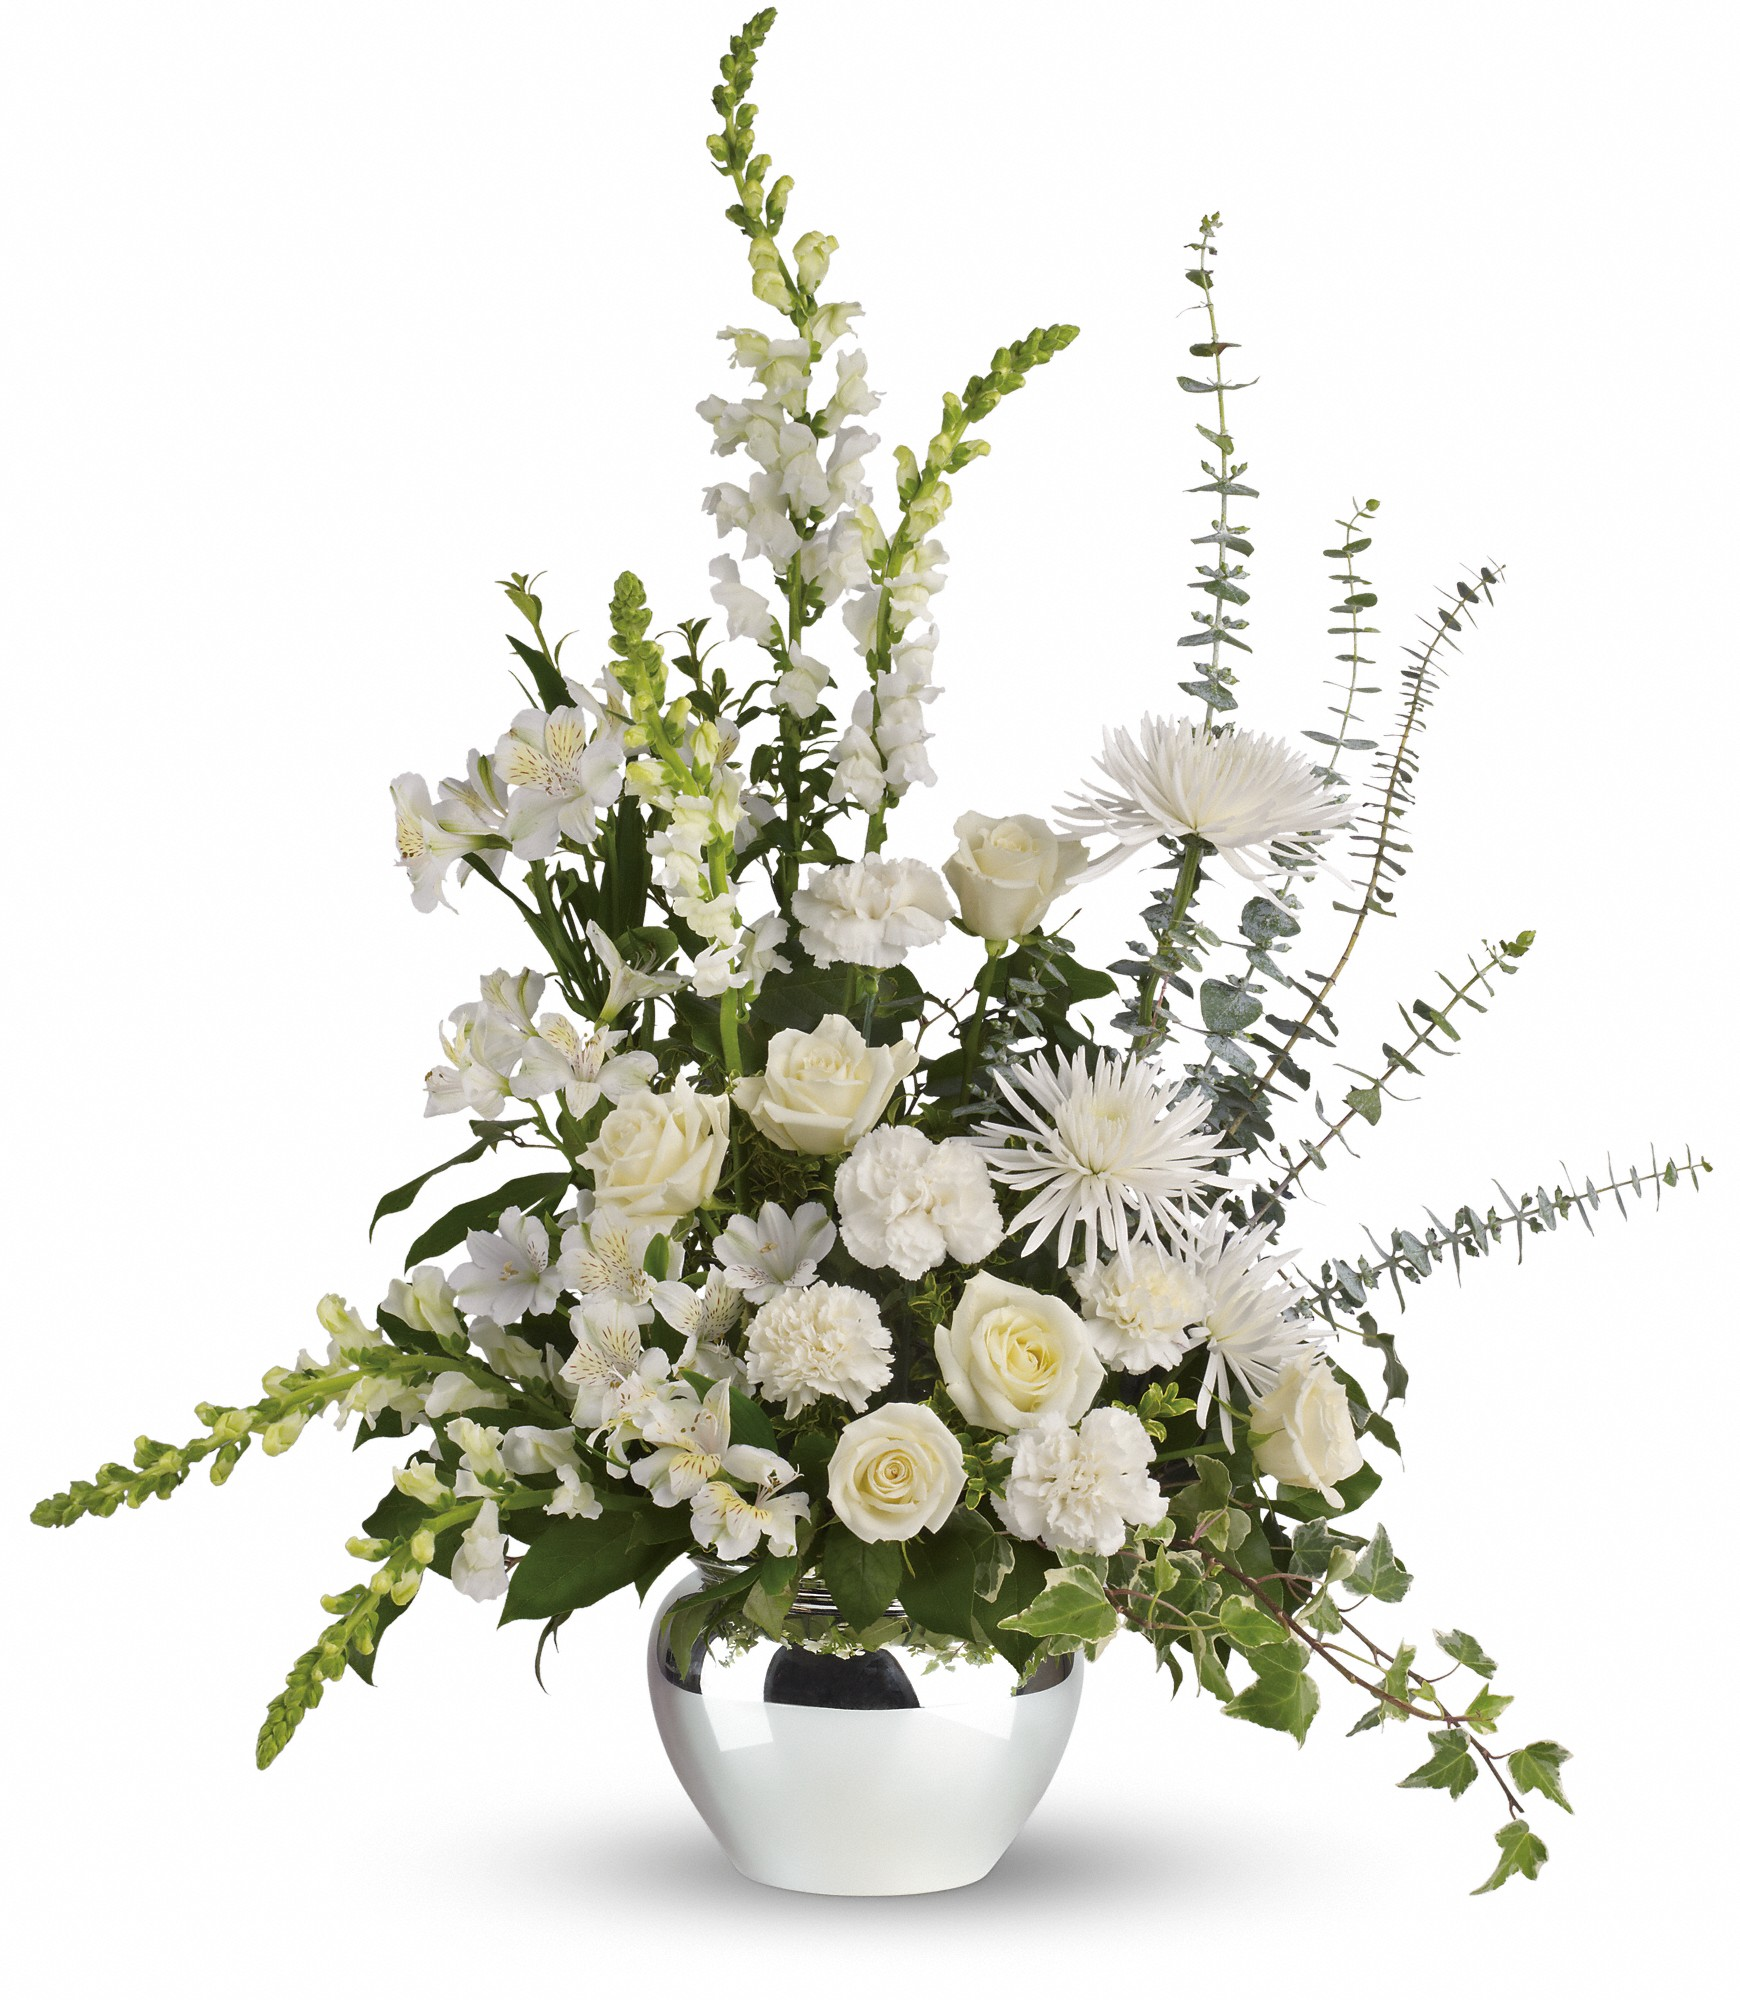 Chinese Funeral Flowers Wording Flowers Healthy